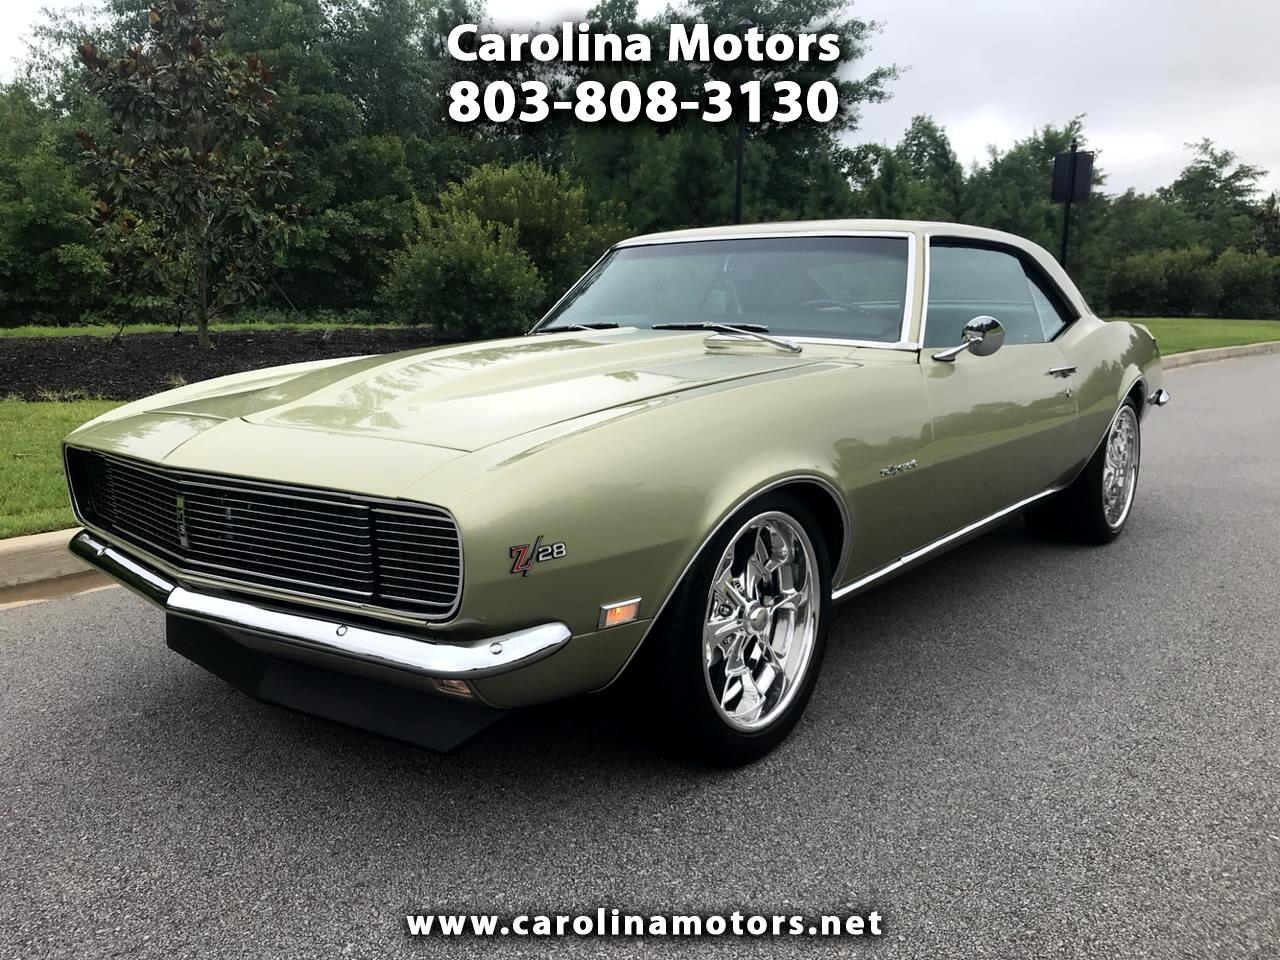 1968 Chevrolet Camaro Coupe Z/28 Pro Touring / Restro Mod